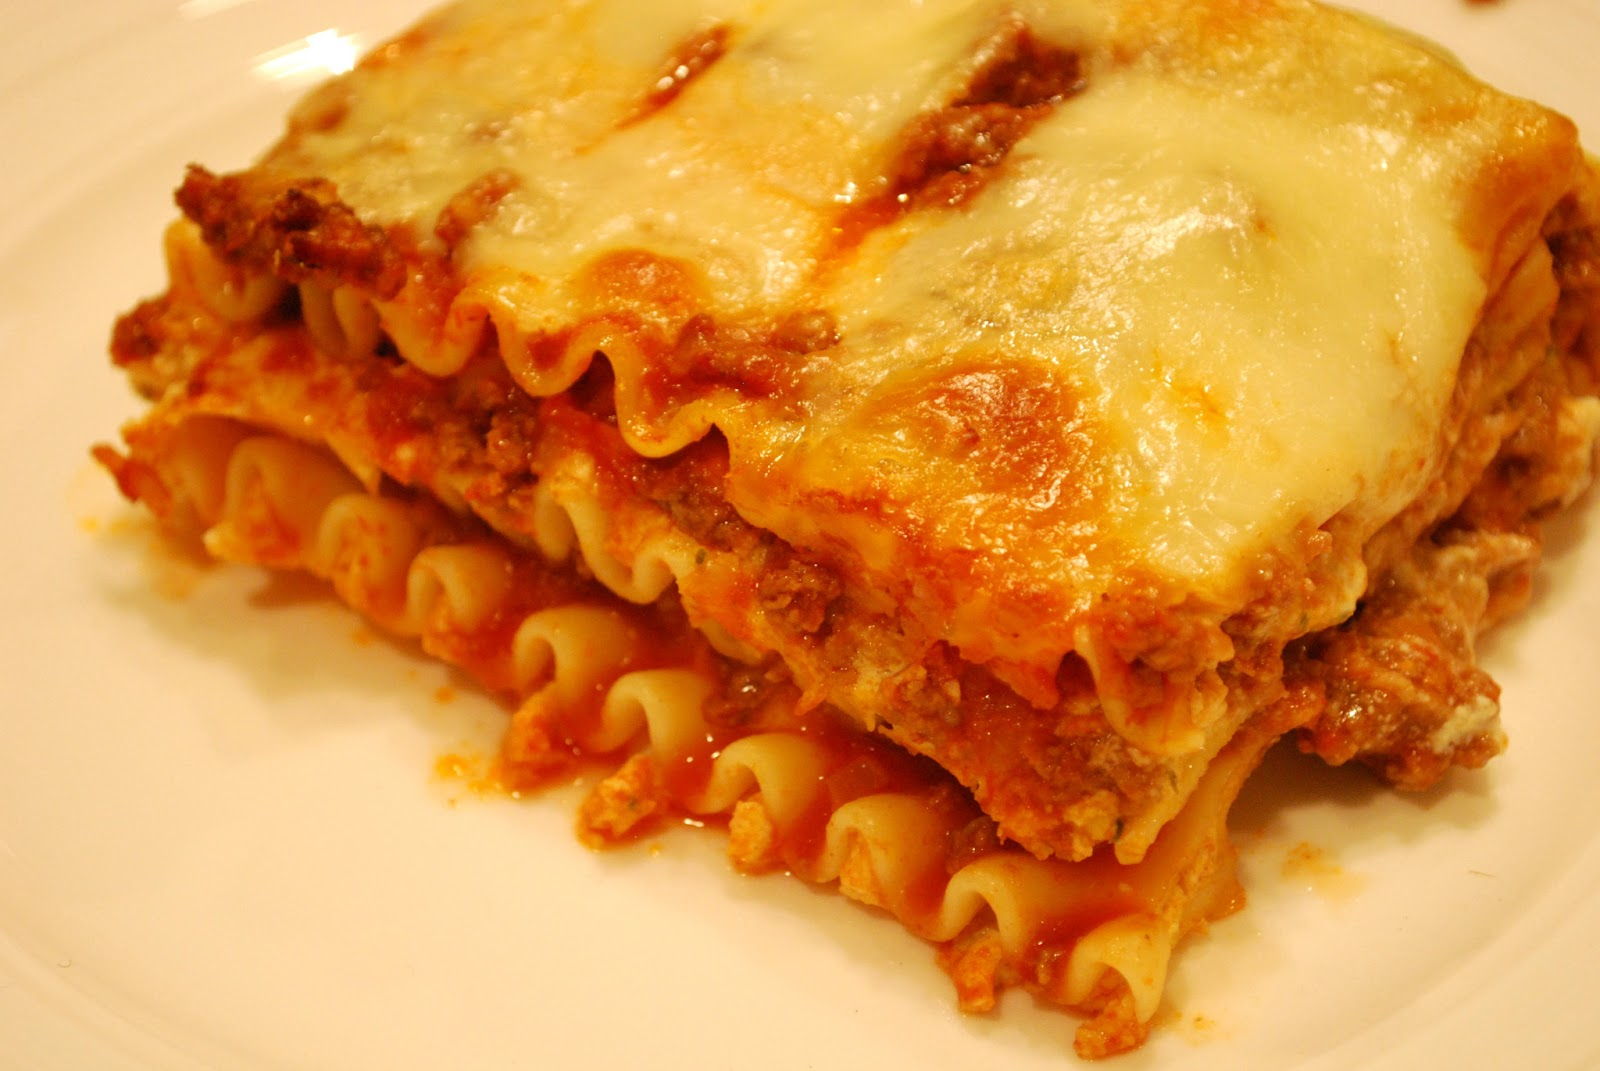 classic lasagna recipe with ricotta cheese